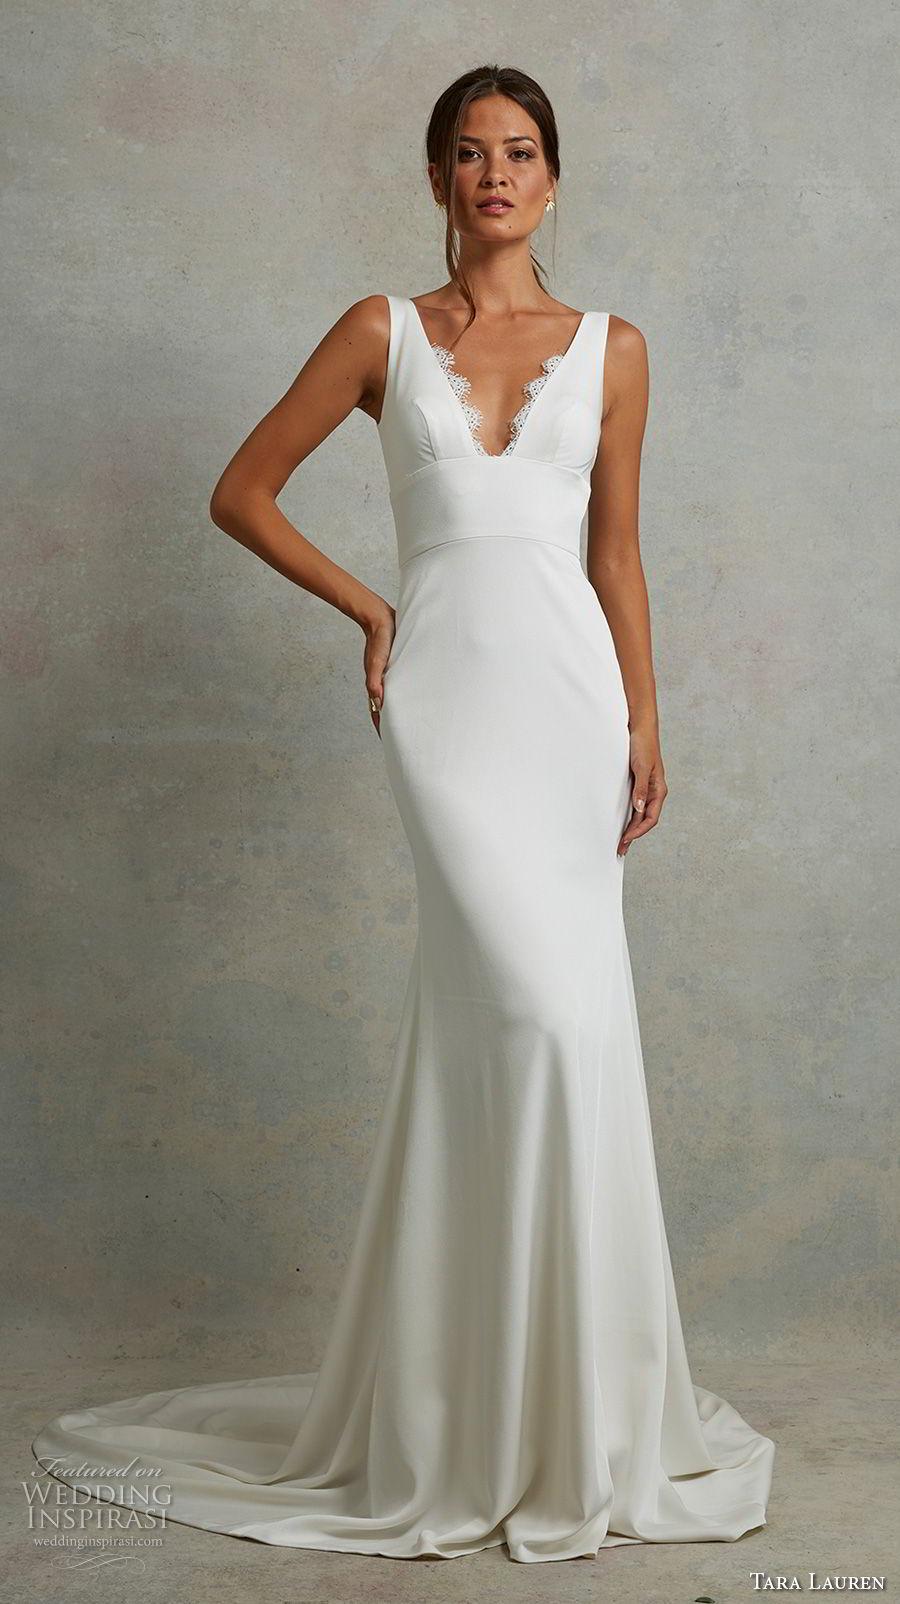 tara lauren spring 2018 bridal sleeveless v neck simple clean elegant fit and flare wedding dress open v back short train (2) mv